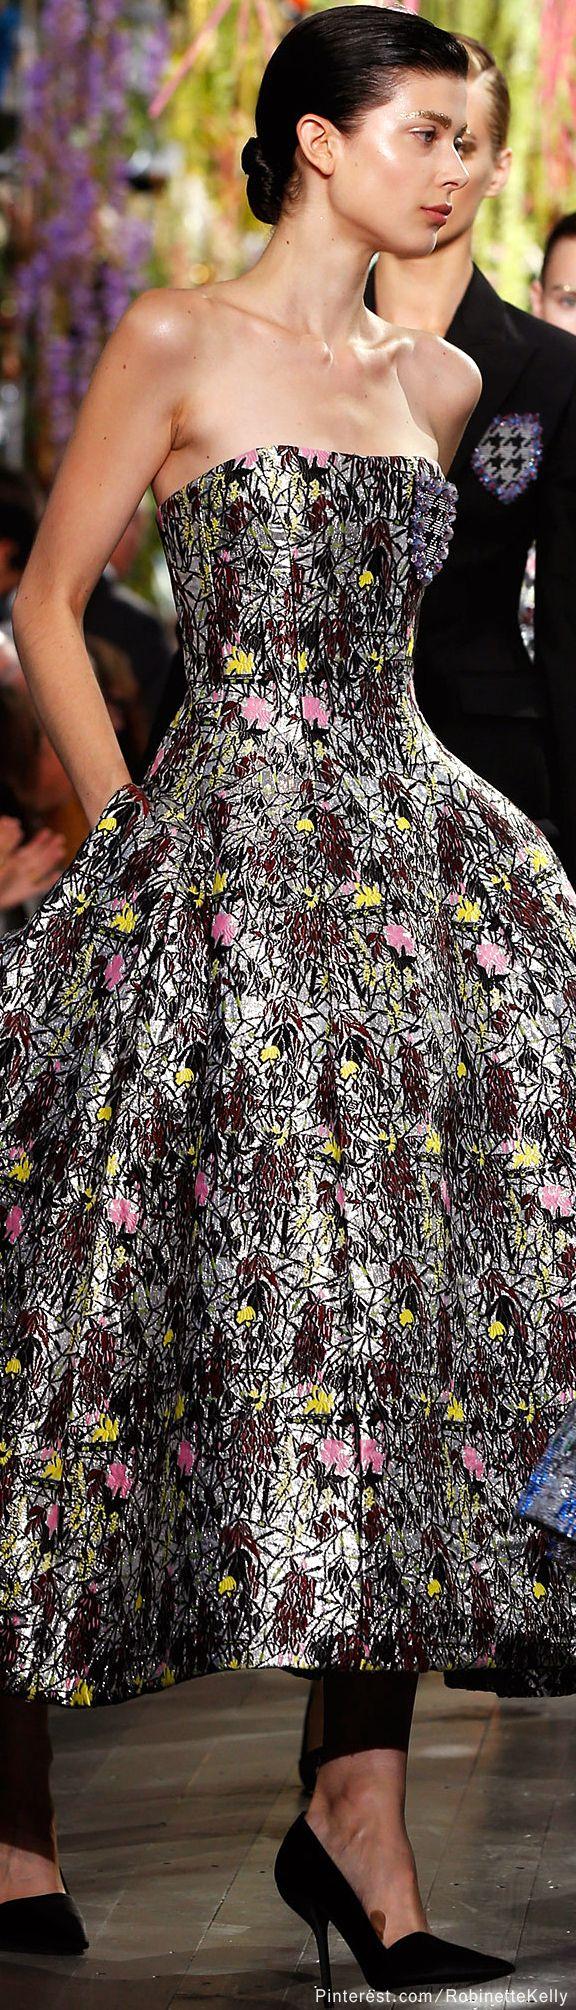 Christian Dior | S/S 2014  XXXXXXXXXXXXXXXXXXXXXXXXXXXXXXXXXXXXXXXXXXXXXXXXXXXXXXXXXXXXXXXXXXXXXXXXXXXXXXXXXXXXXXXXXXXXXXXXXXXXXXXXXXXXX